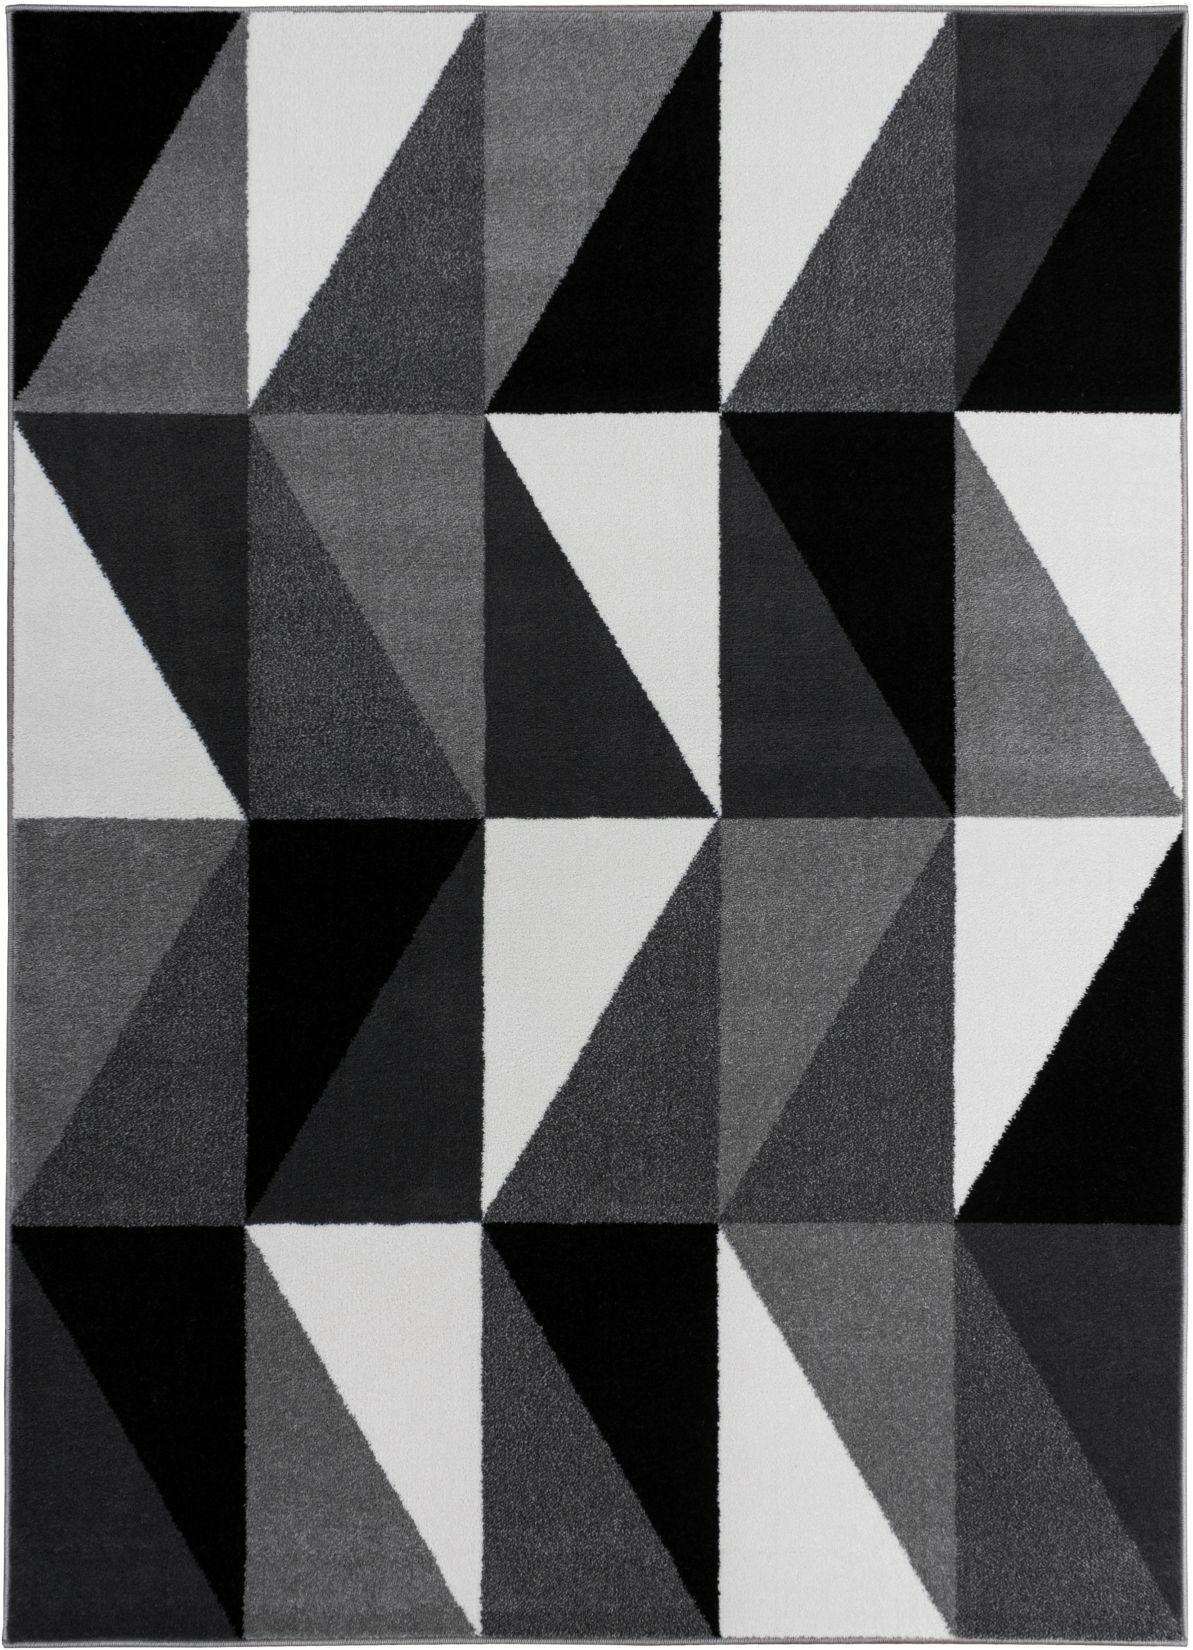 Mcanally Amazing Geometric Grey Area Rug Rug Size: 7'10